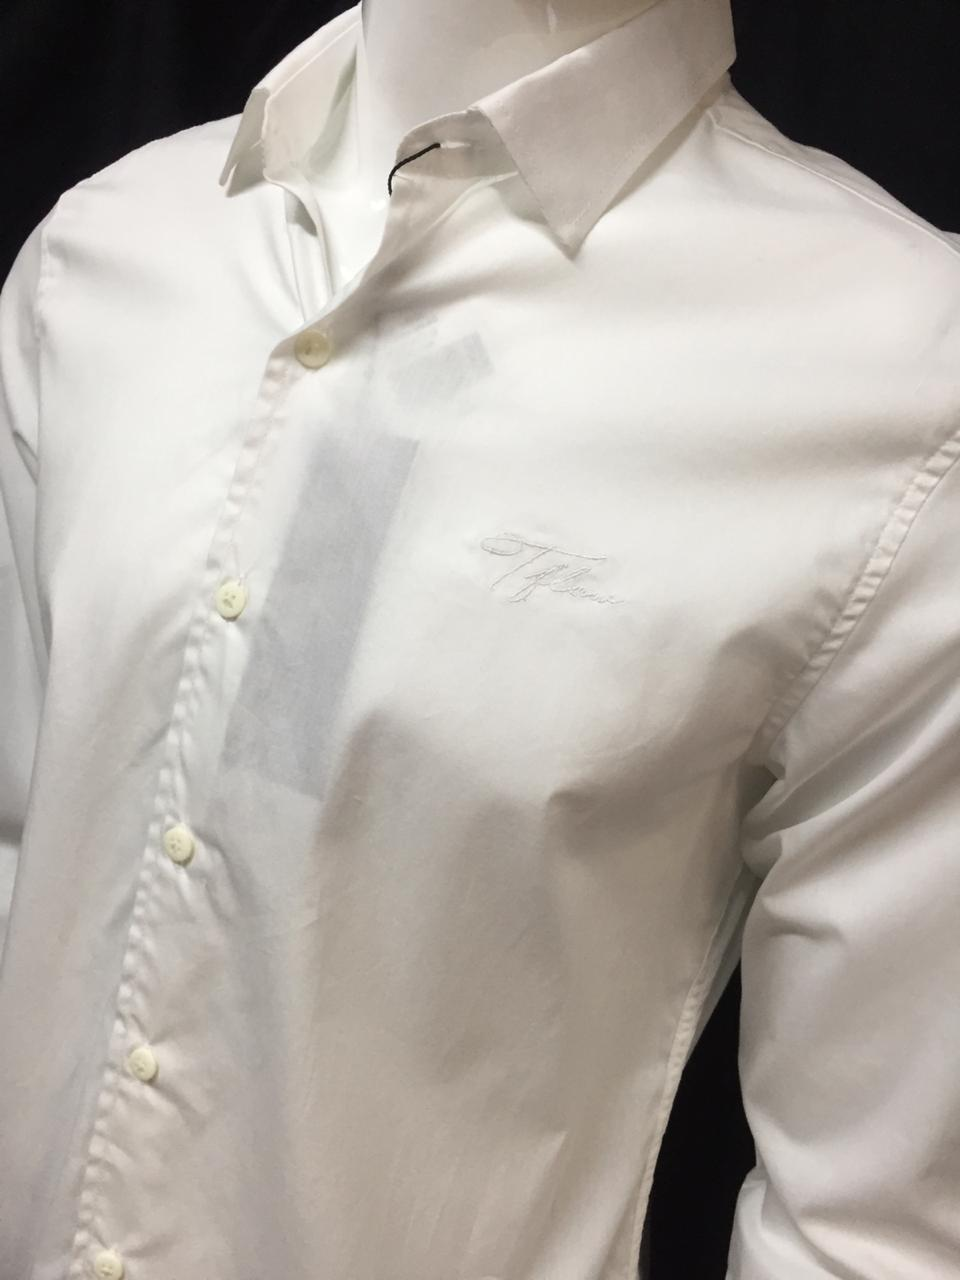 Camisa Masculina Tflow Manga Longa Algodão Lisa - Branco